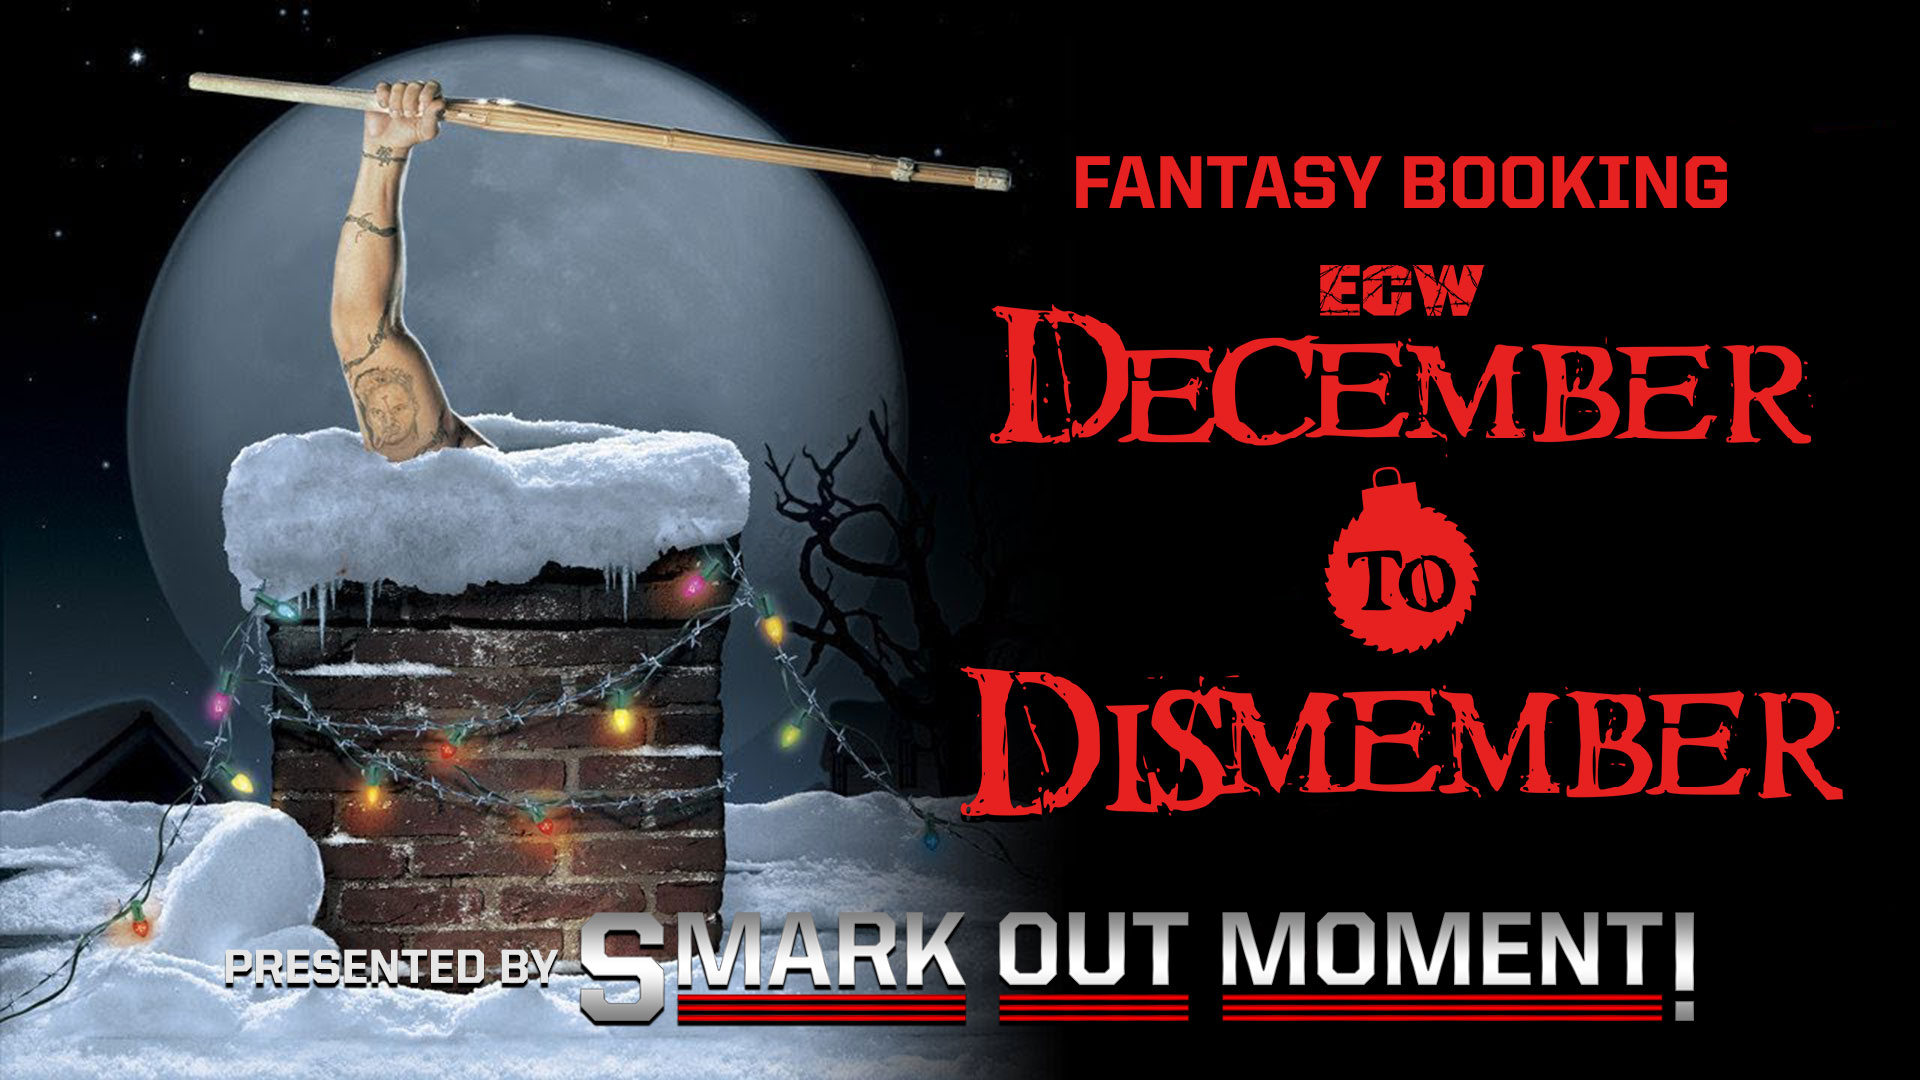 Fantasy Booking December to Dismember 2006 ECW